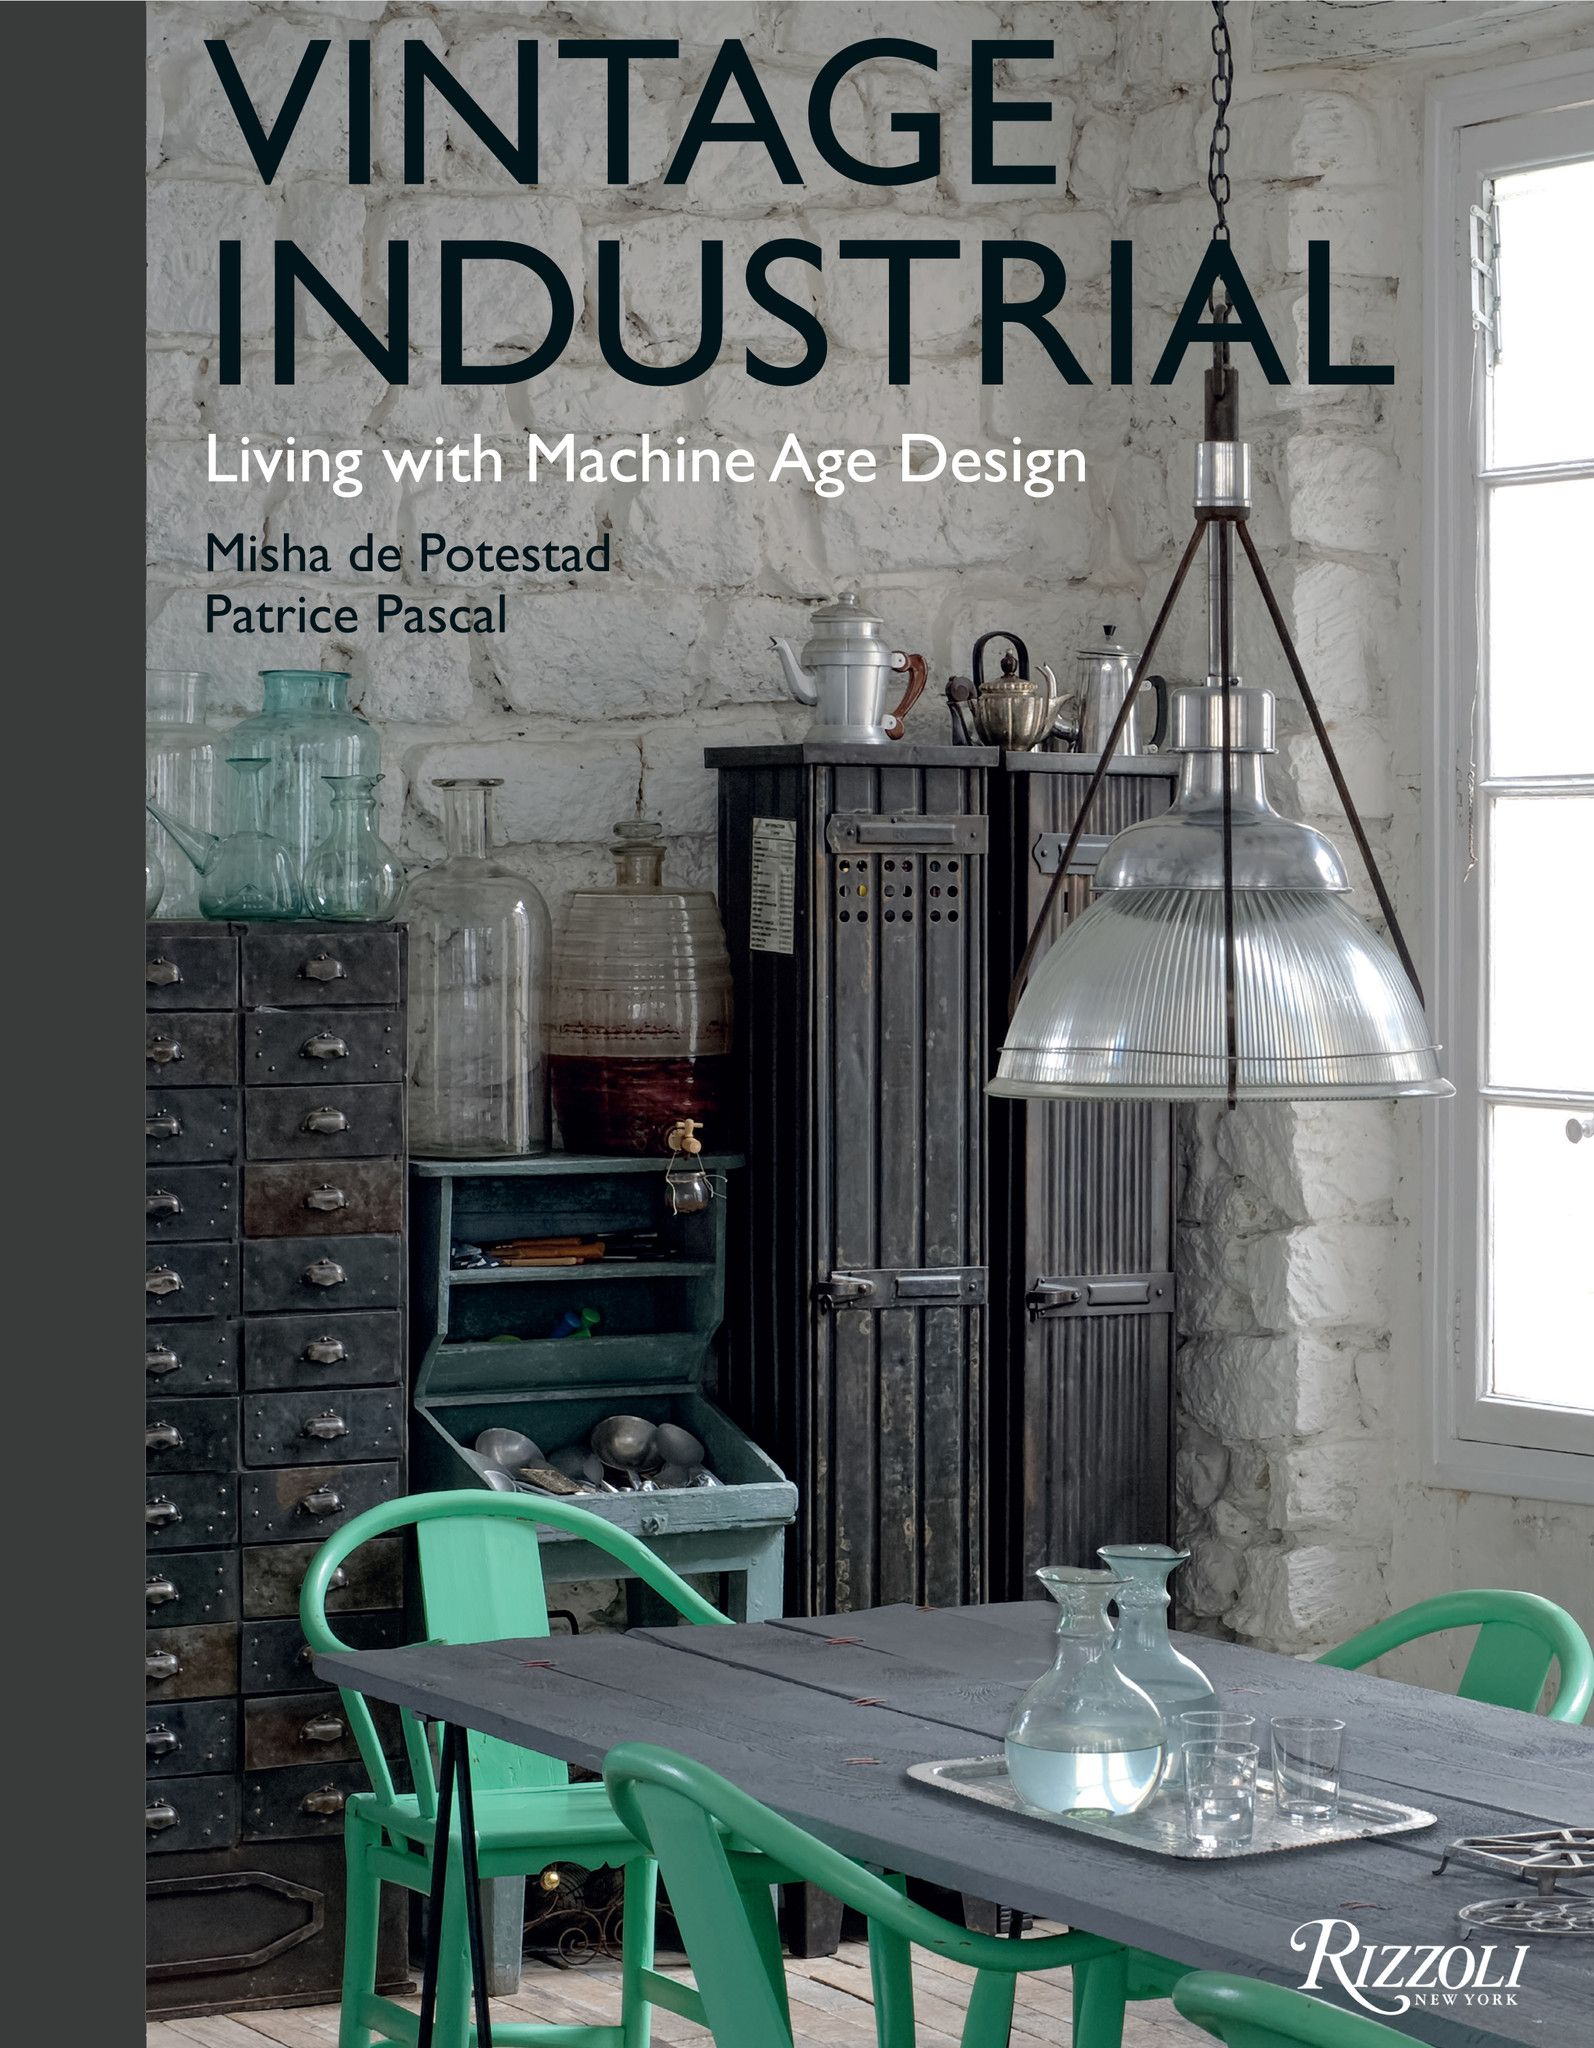 Vintage house interior design vintage industrial machine age design  coffee table book  machine